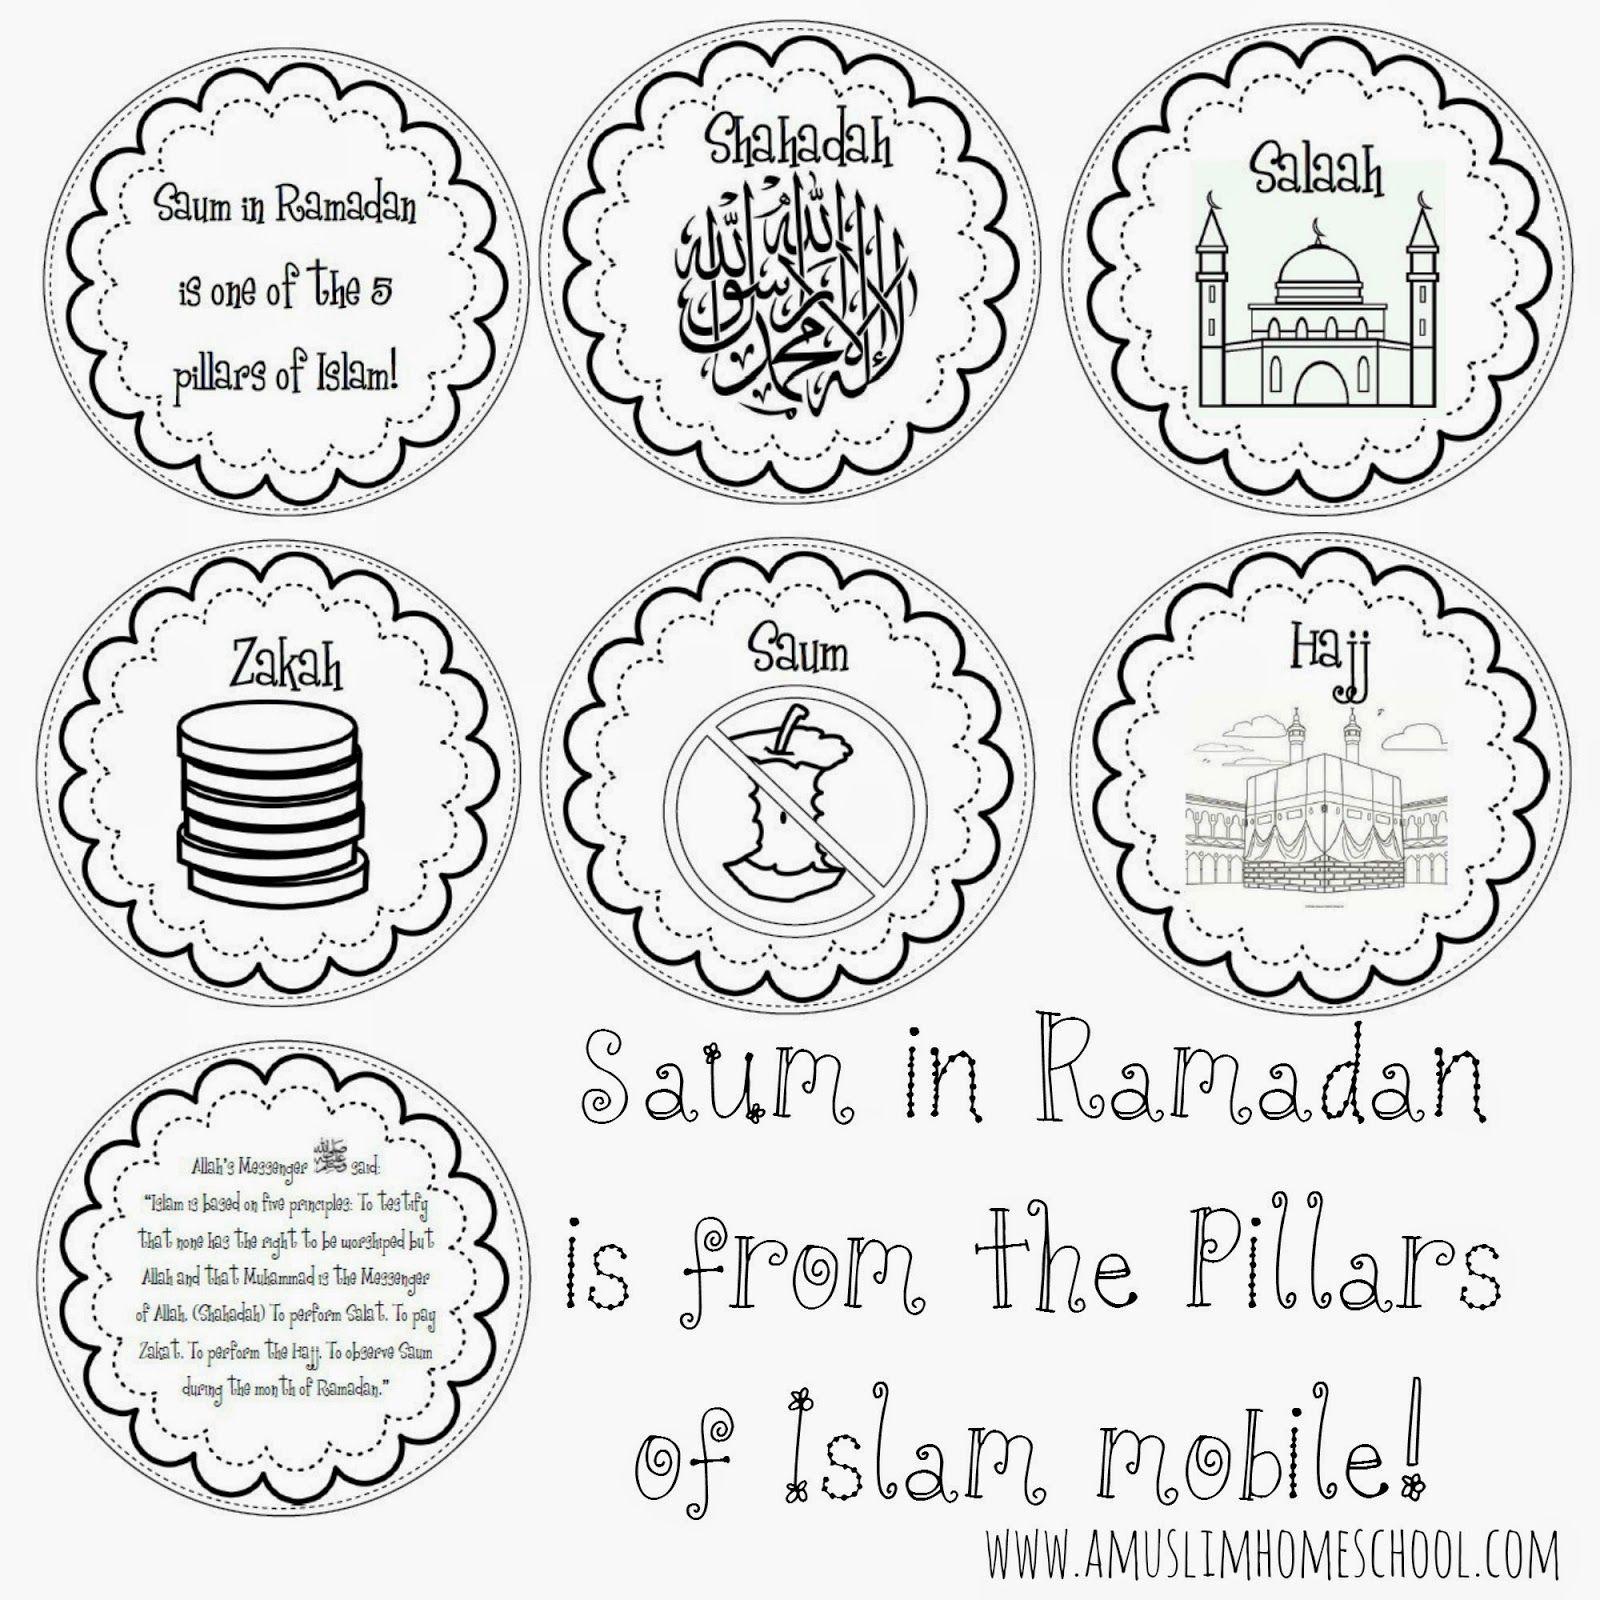 saum in ramadan is one of the 5 pillars mobile islam activities